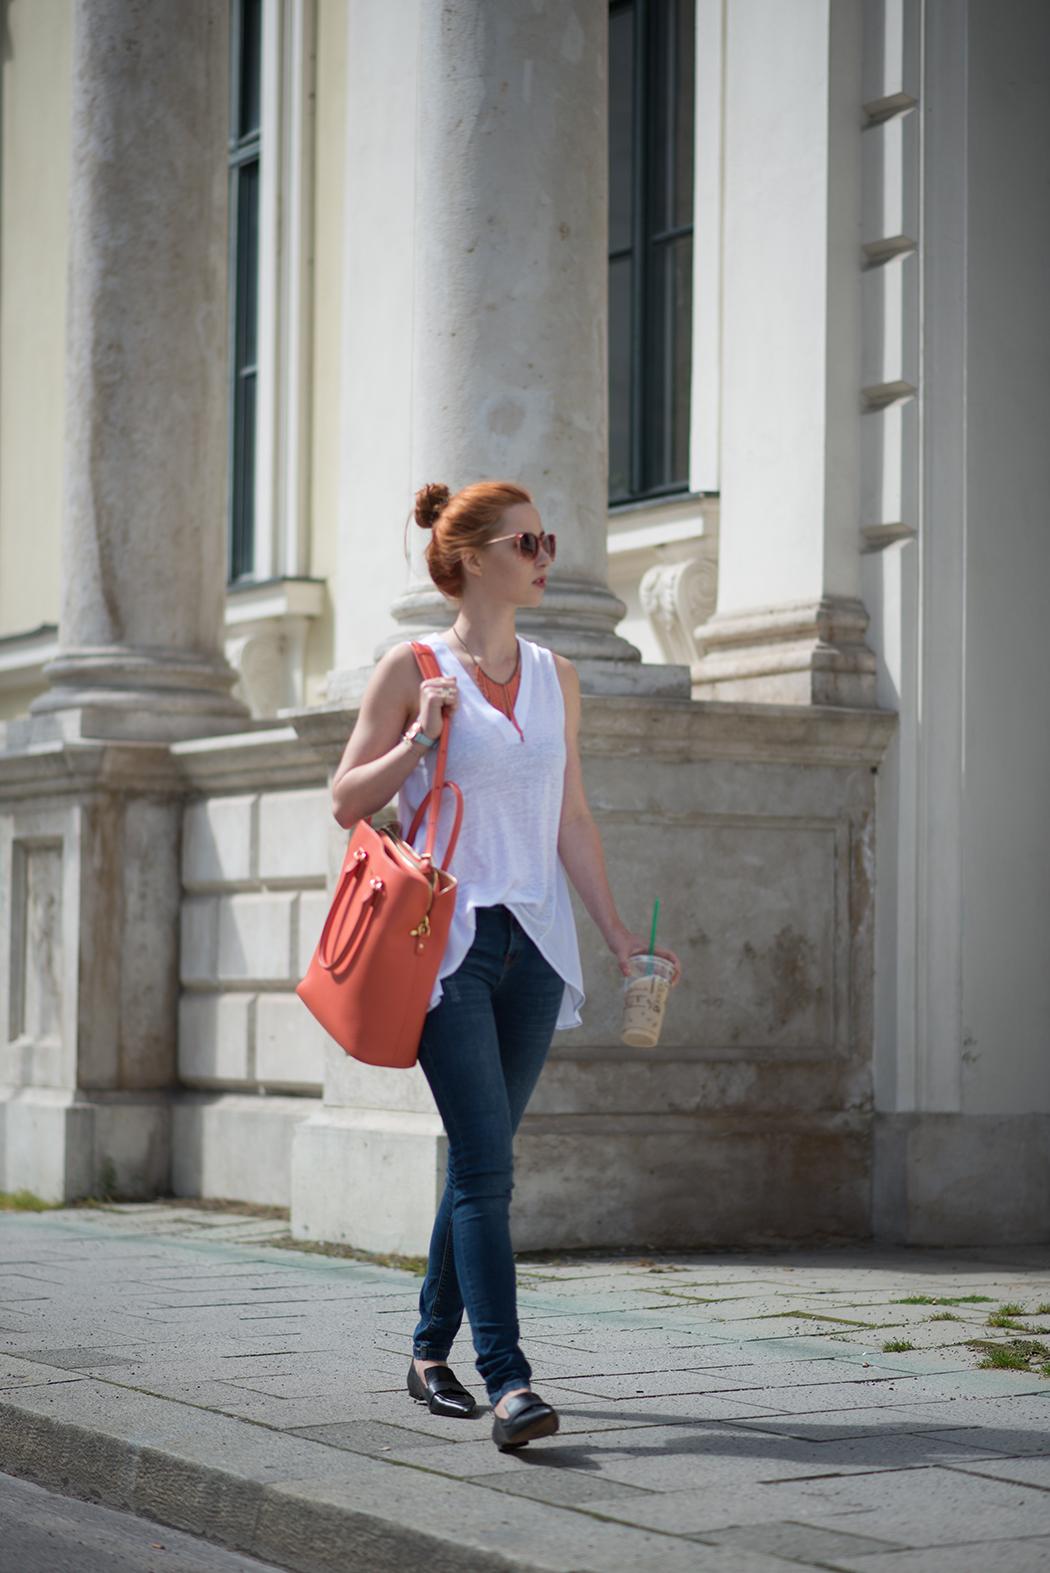 Fashionblog-Fashionblogger-Fashion-Blog-München-Deutschland-Any-Di-Tasche-München-spitze-Loafer-Superjeans of sweden -Linda-Rella-Lindarella-Fitnessblog-2